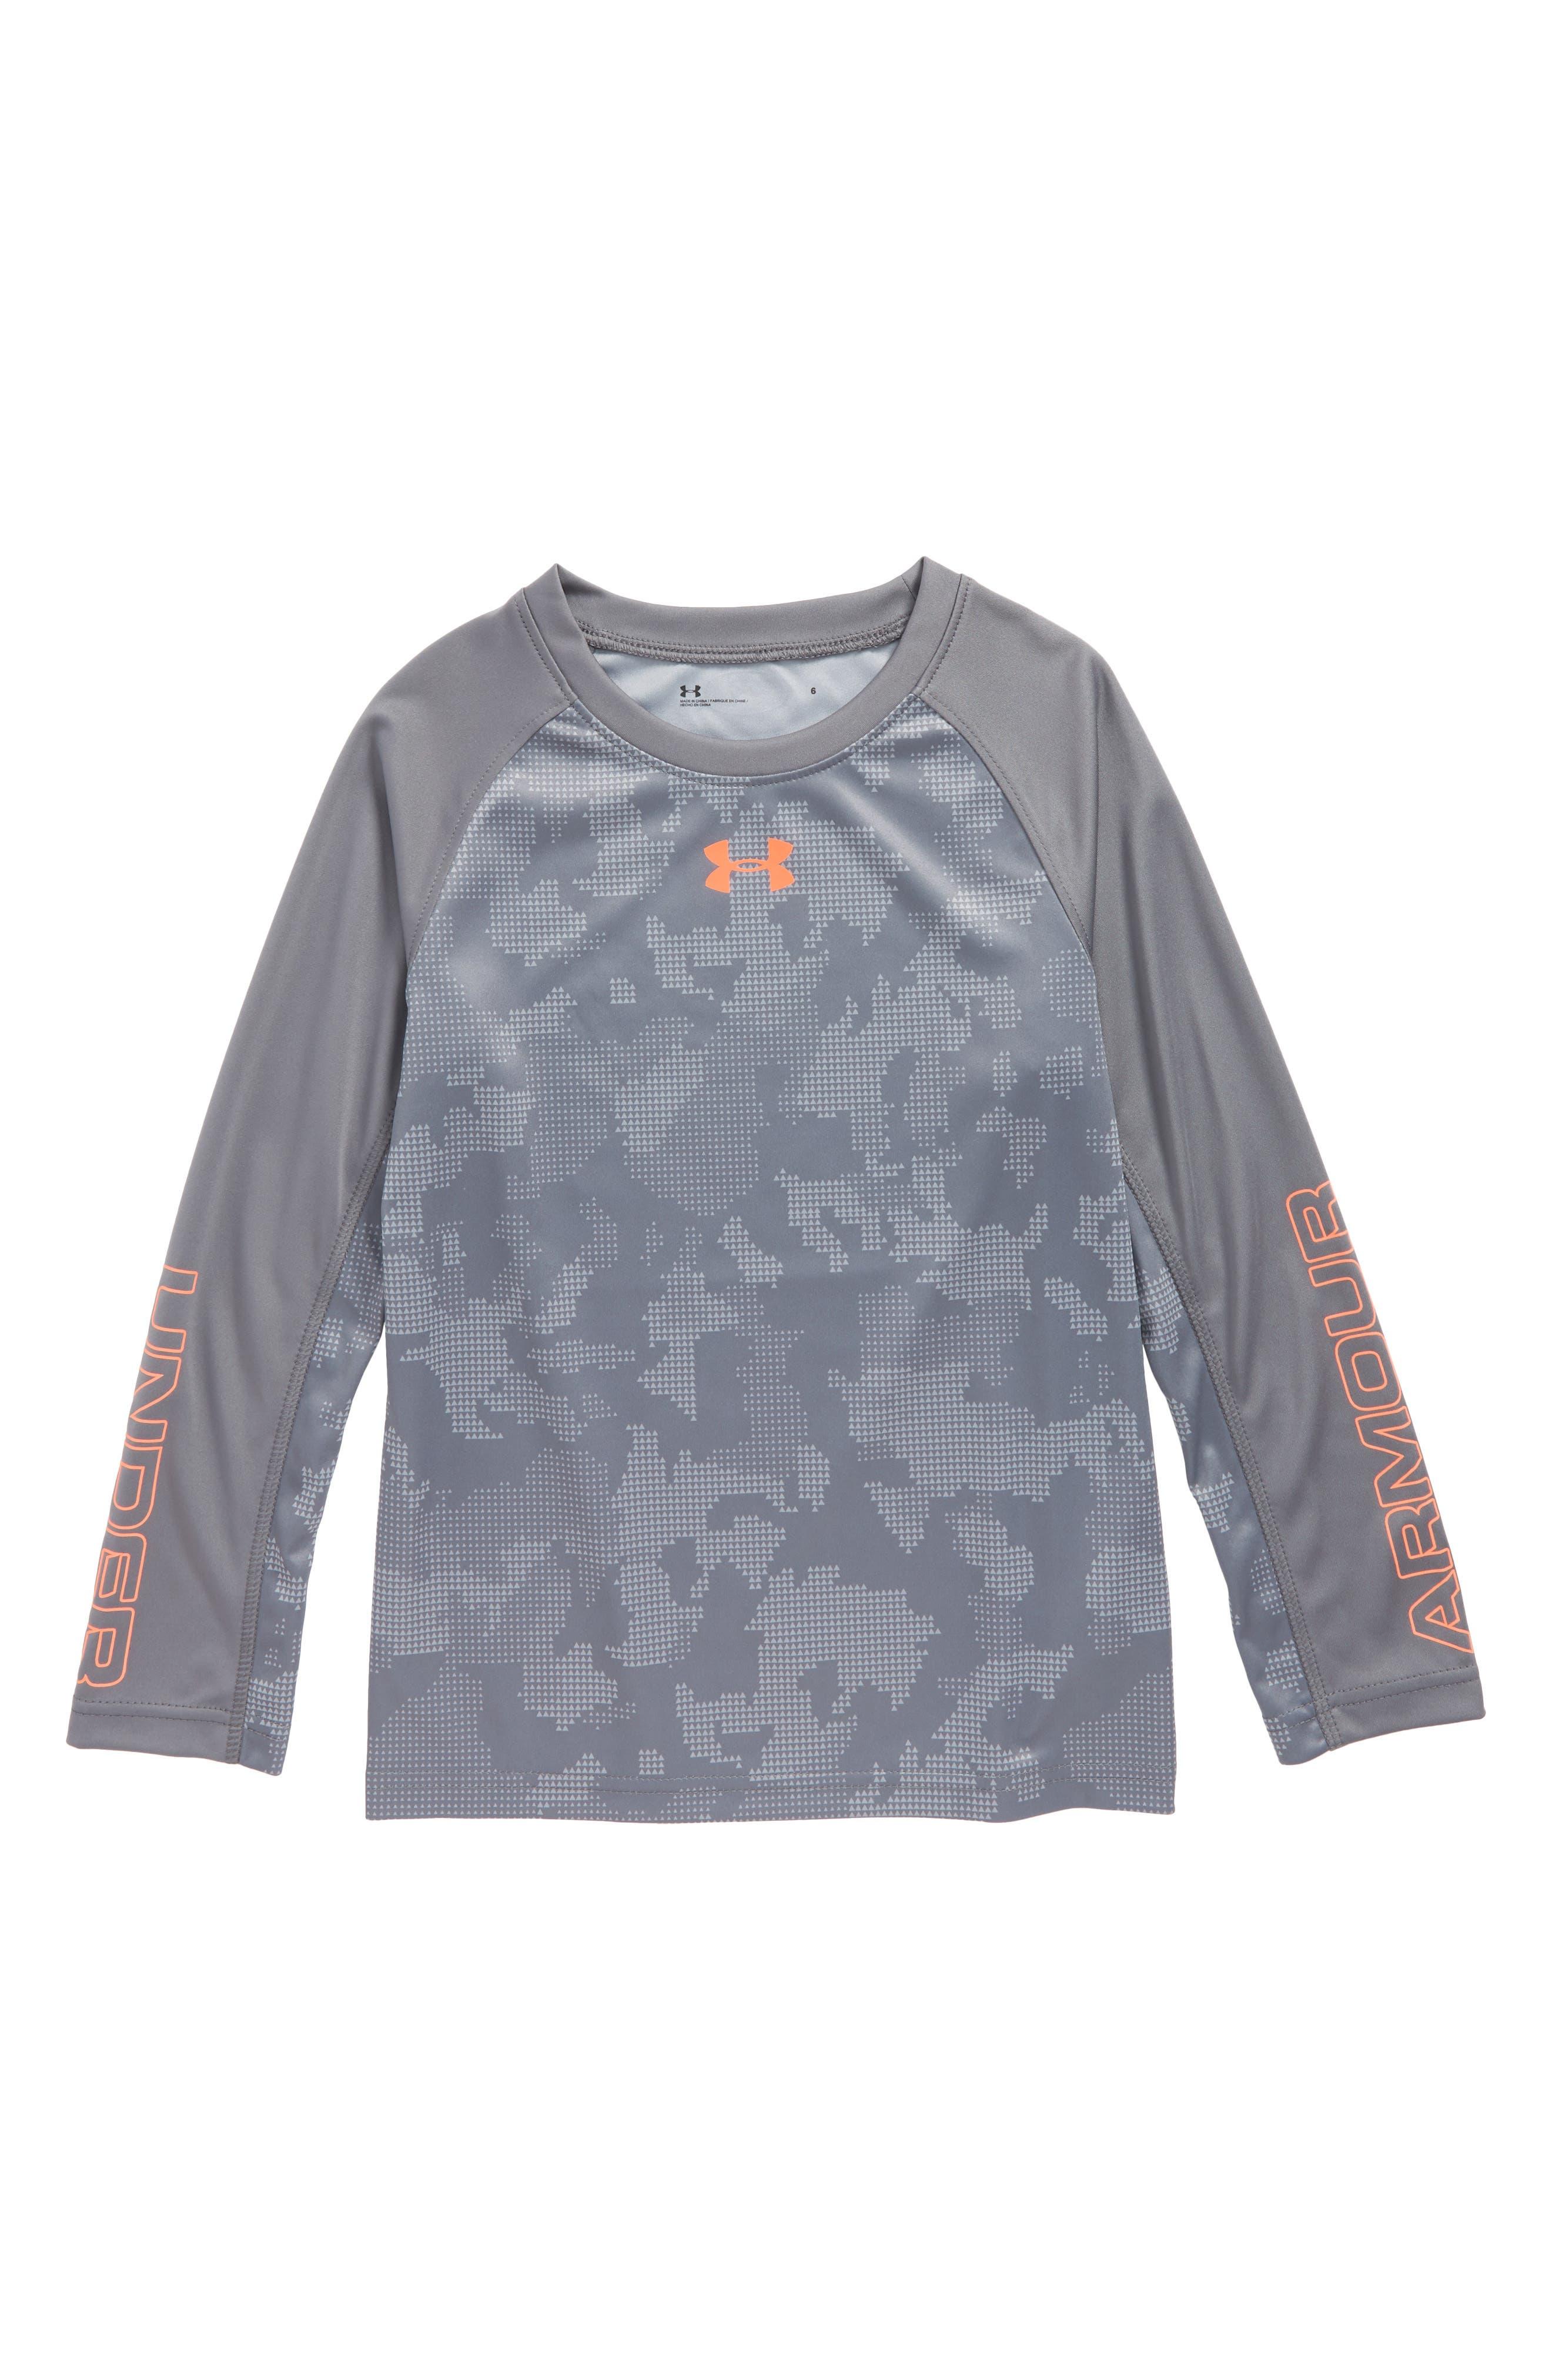 Main Image - Under Armour Utility Raglan Long Sleeve T-Shirt (Toddler Boys & Little Boys)